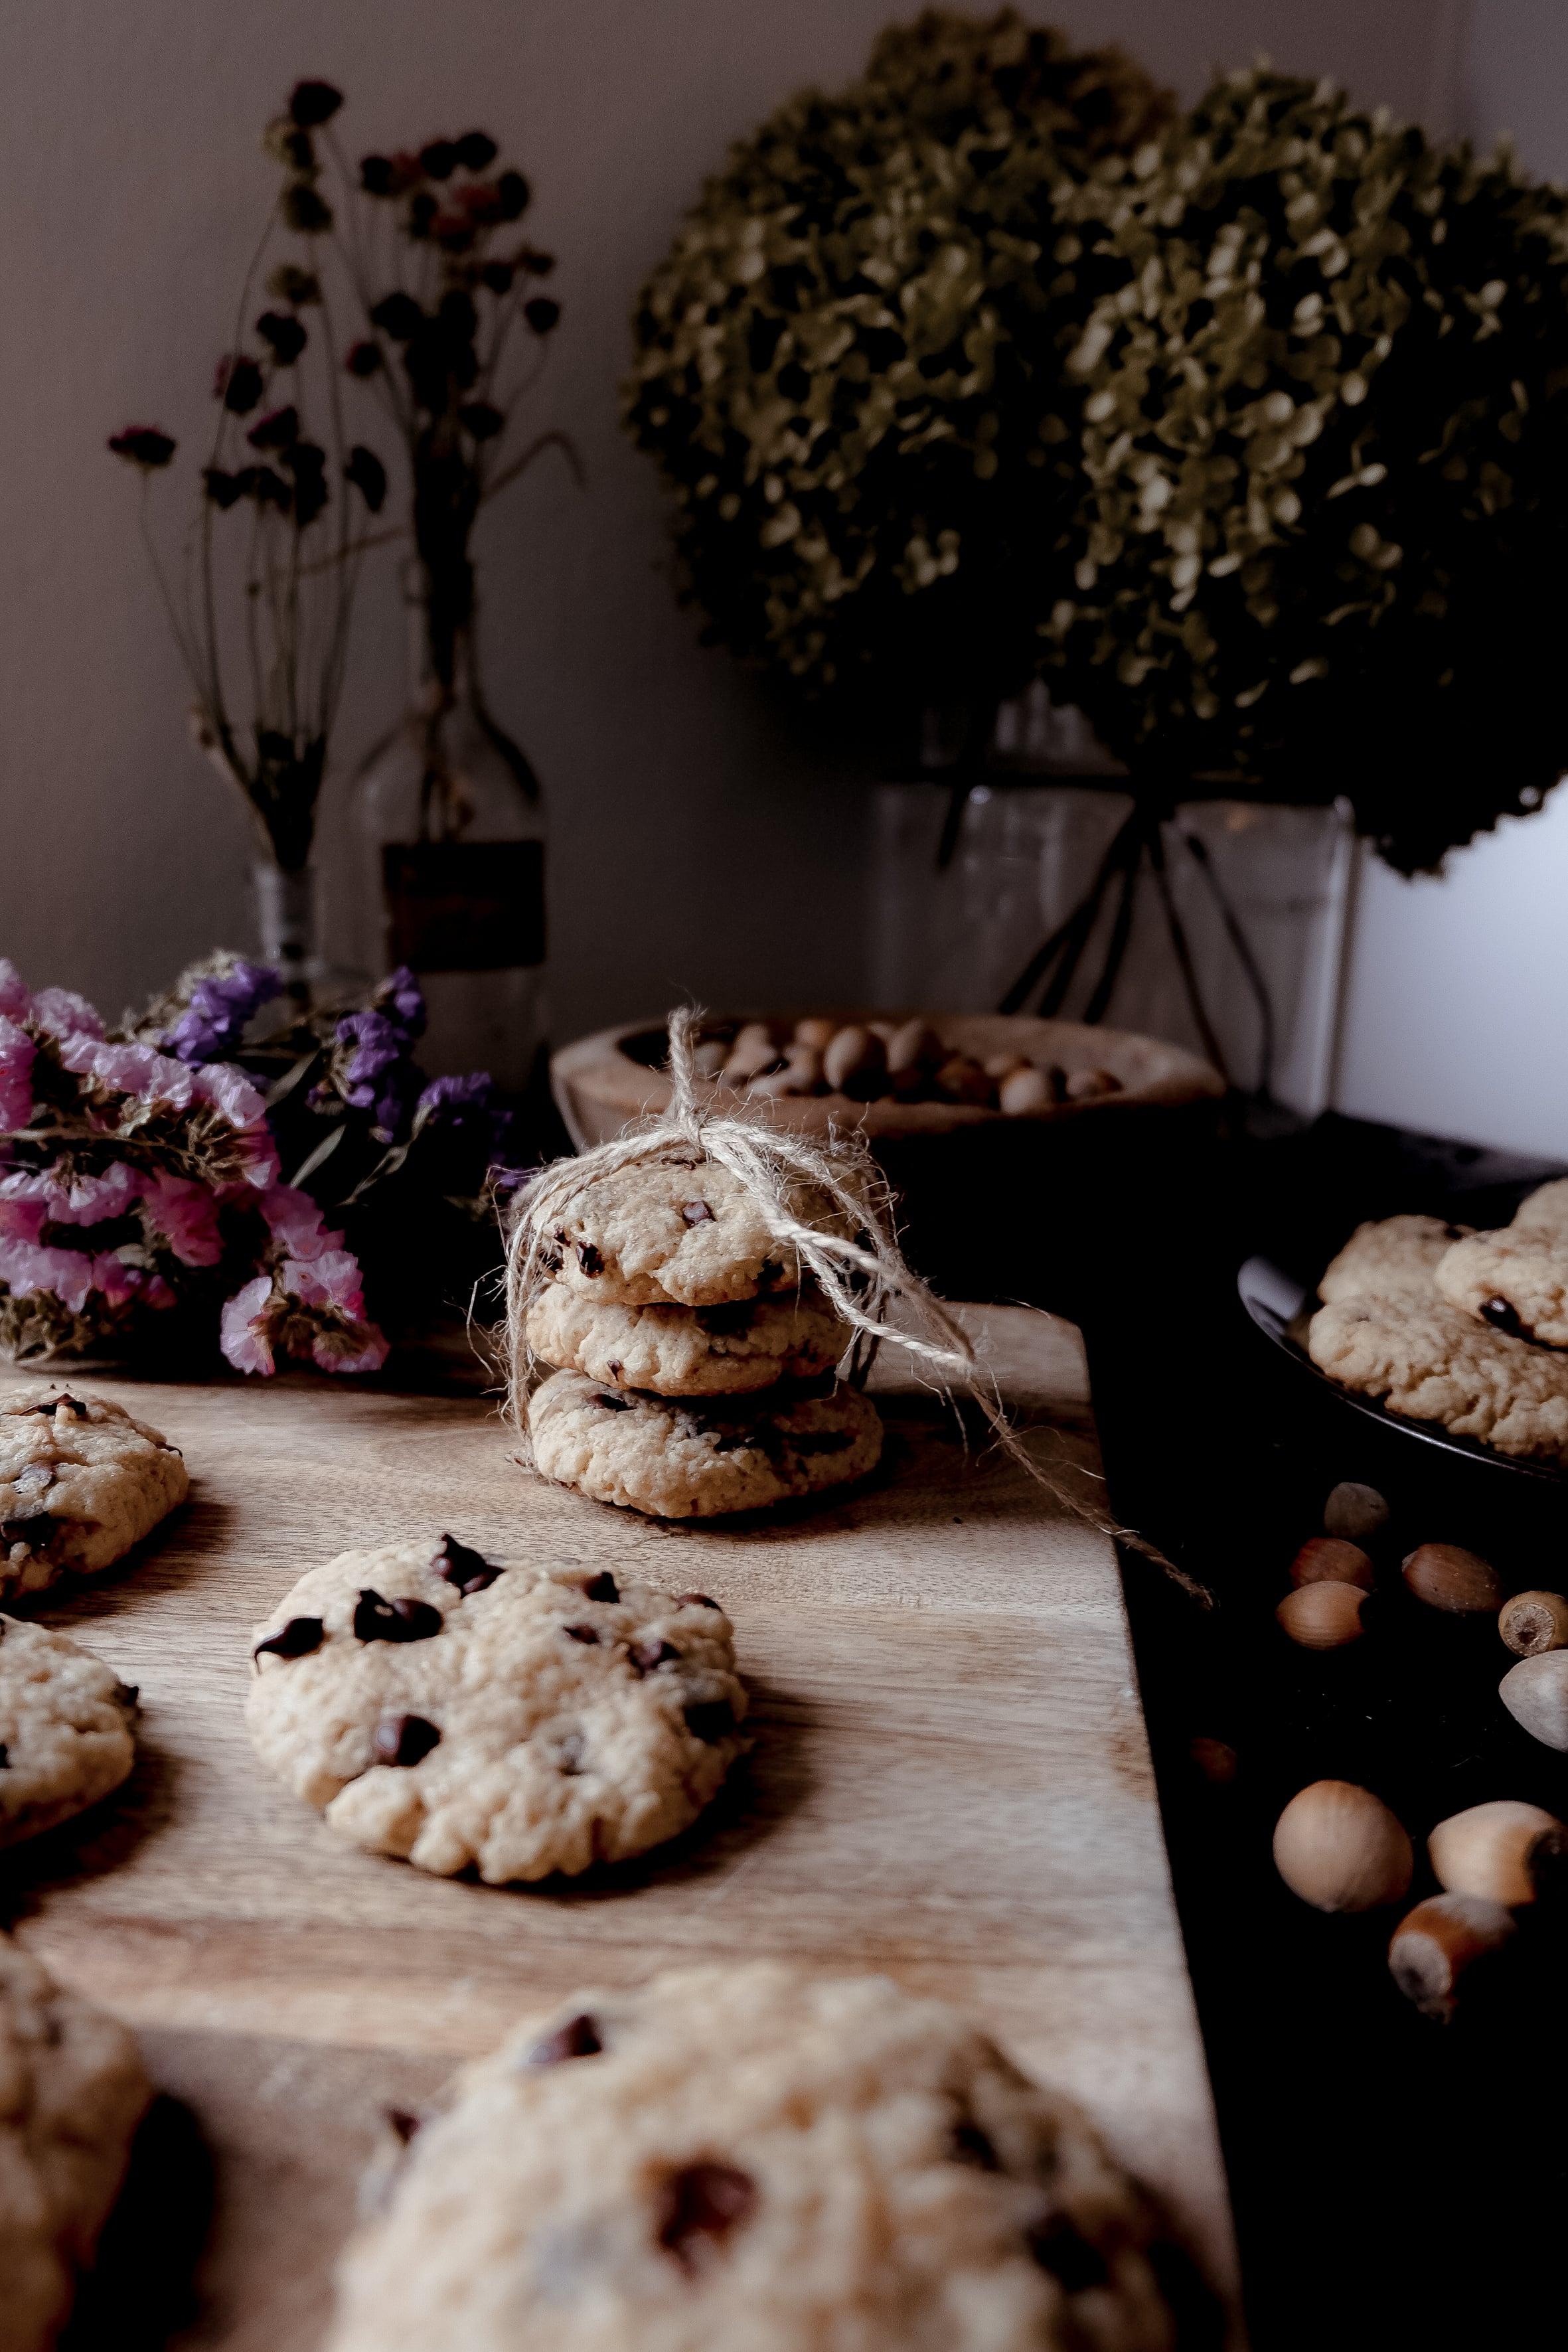 Carnet Sauvage - blog food Lille - cookies avoine chocolat2.jpg